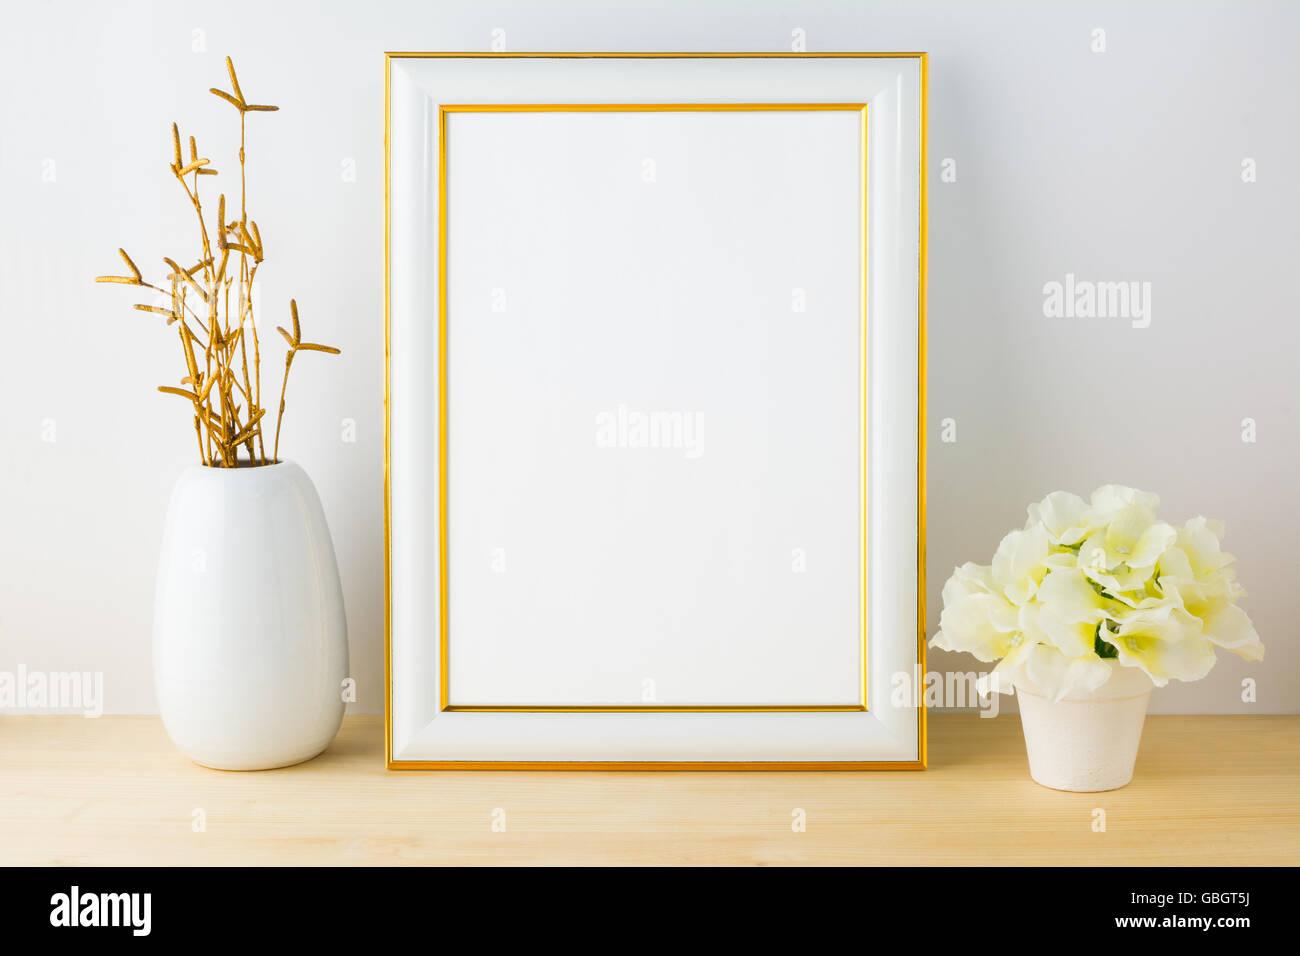 Poster design mockup - Frame Mockup With White Flowerpot Frame Mockup Poster Mockup Styled Mockup Portrait Frame Mockup Product Mockup Design Mo